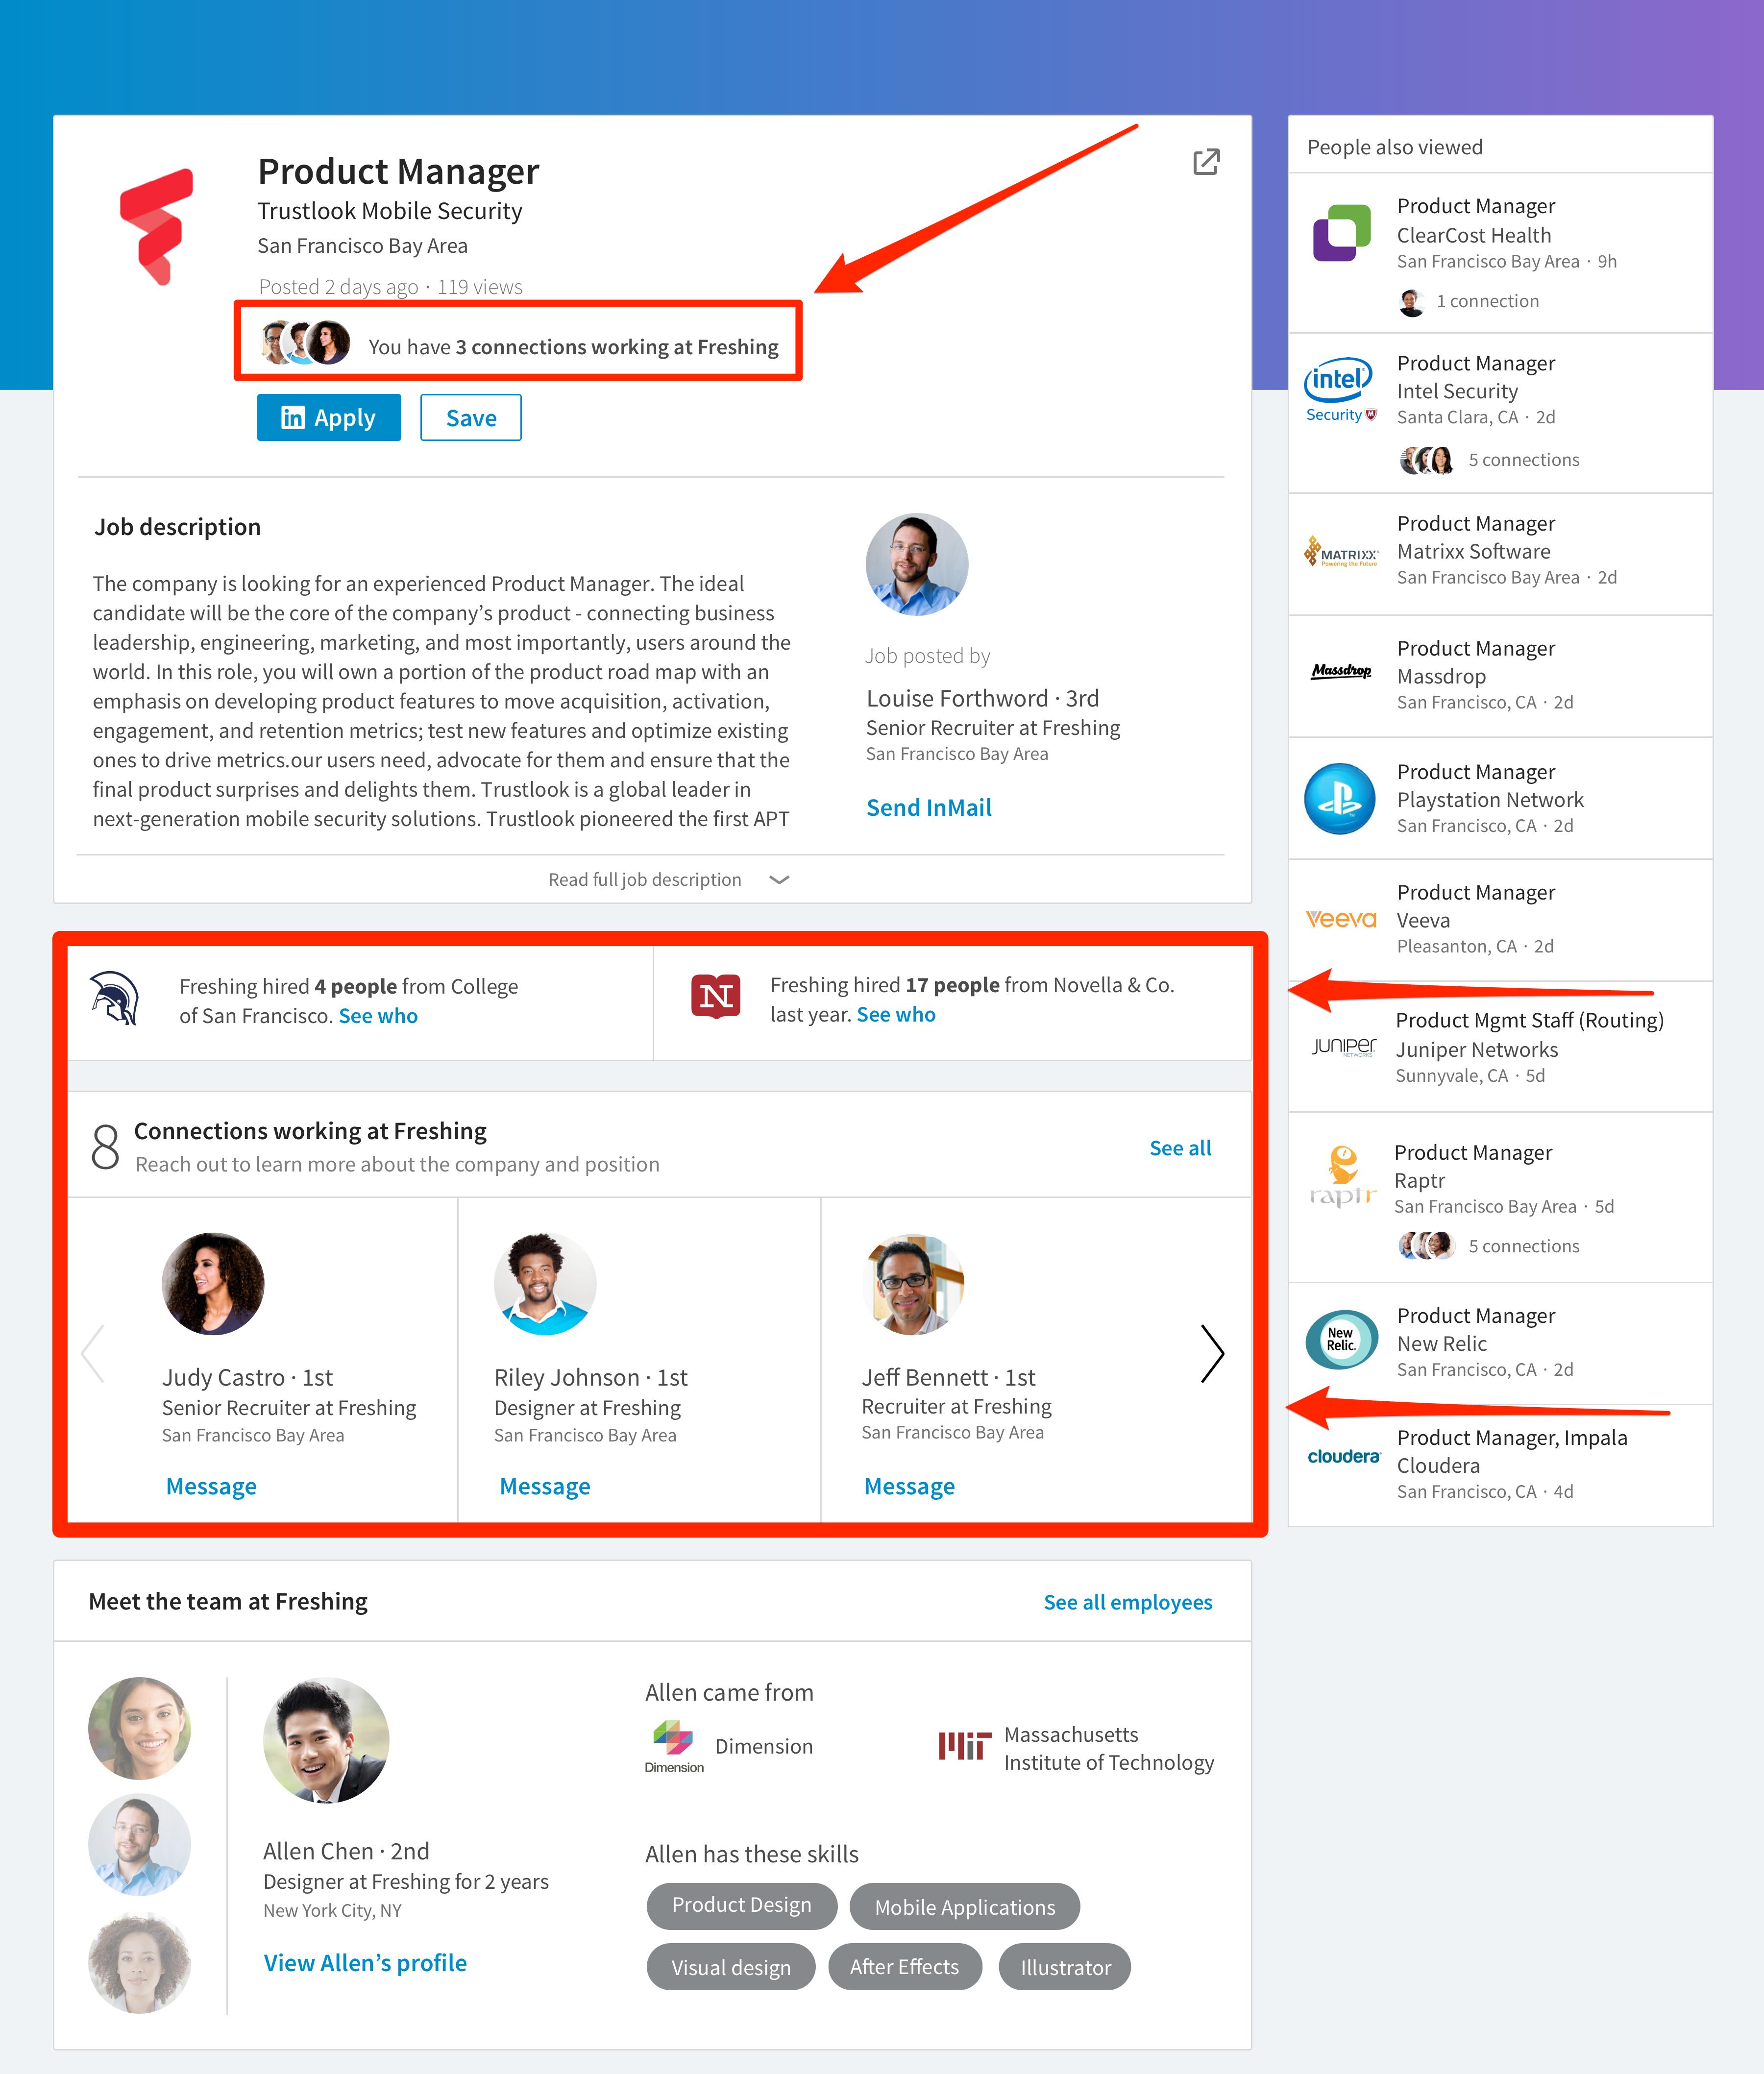 LinkedIn just completely overhauled its job postings to